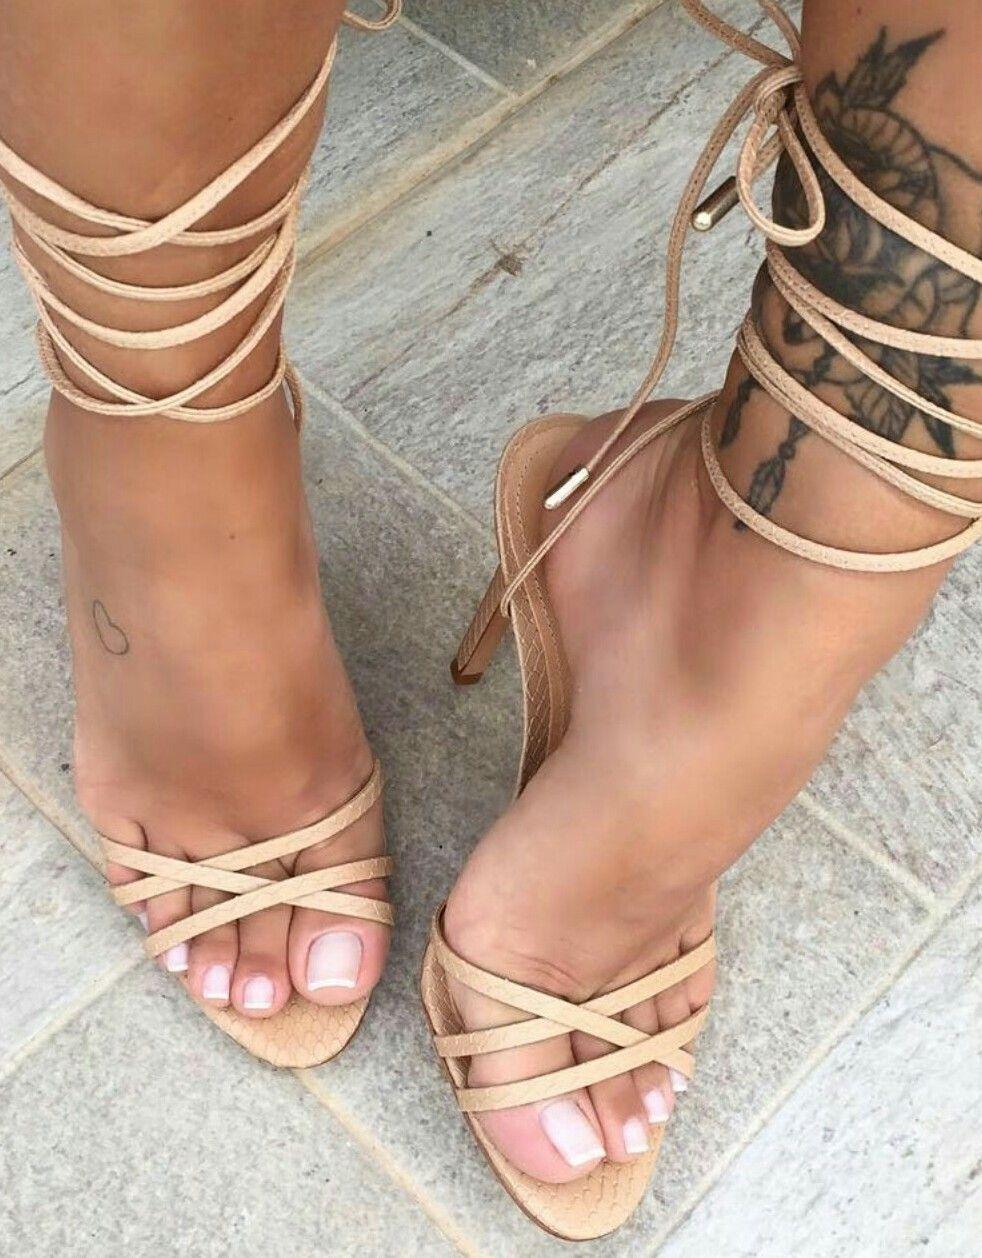 braless Feet Angie Sou naked photo 2017